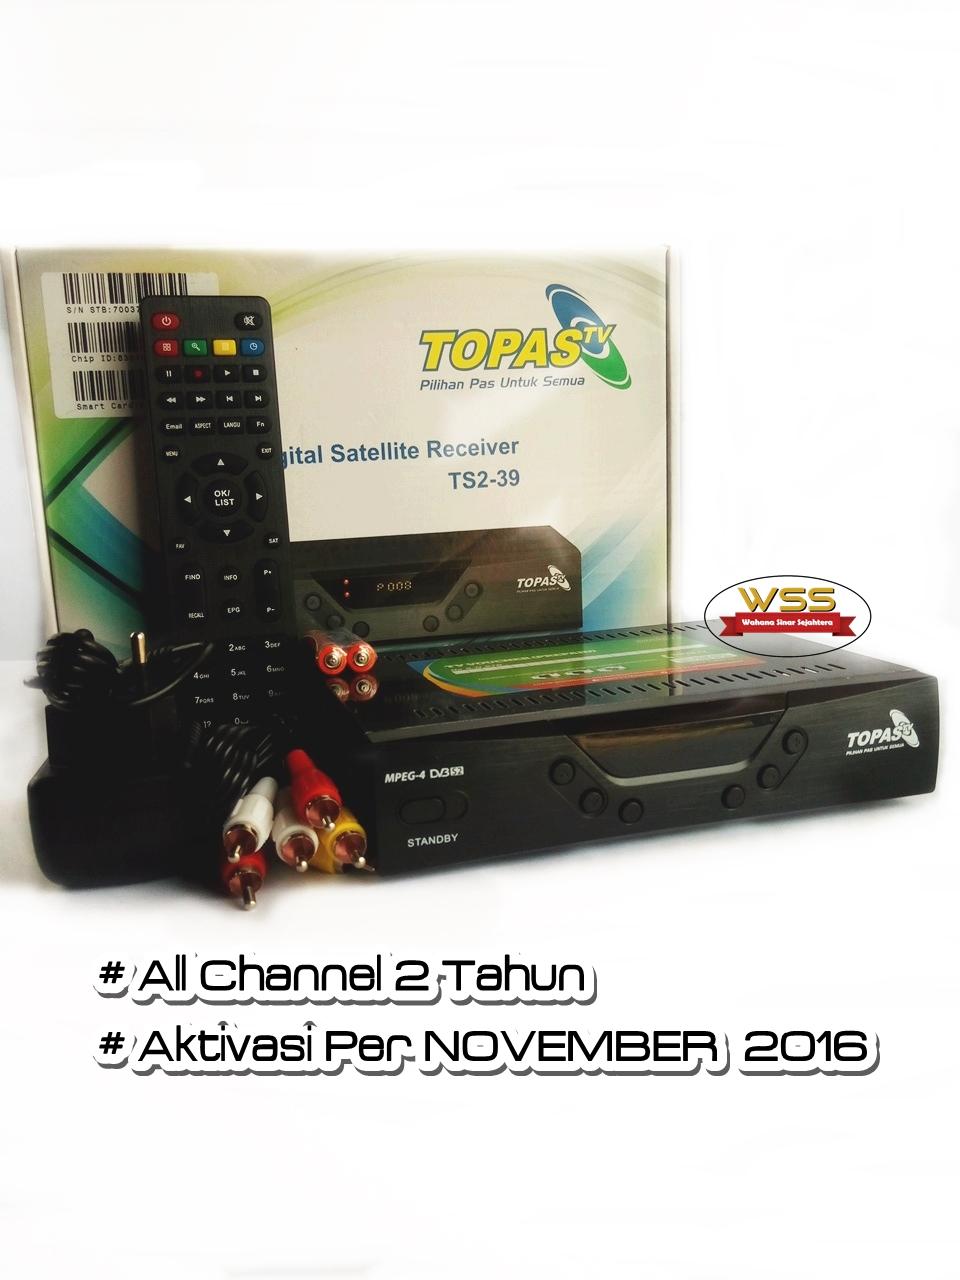 DECODER TOPAS TV HD - ALL CHANNEL 2 TAHUN AKTIVASI NOVEMBER 2016